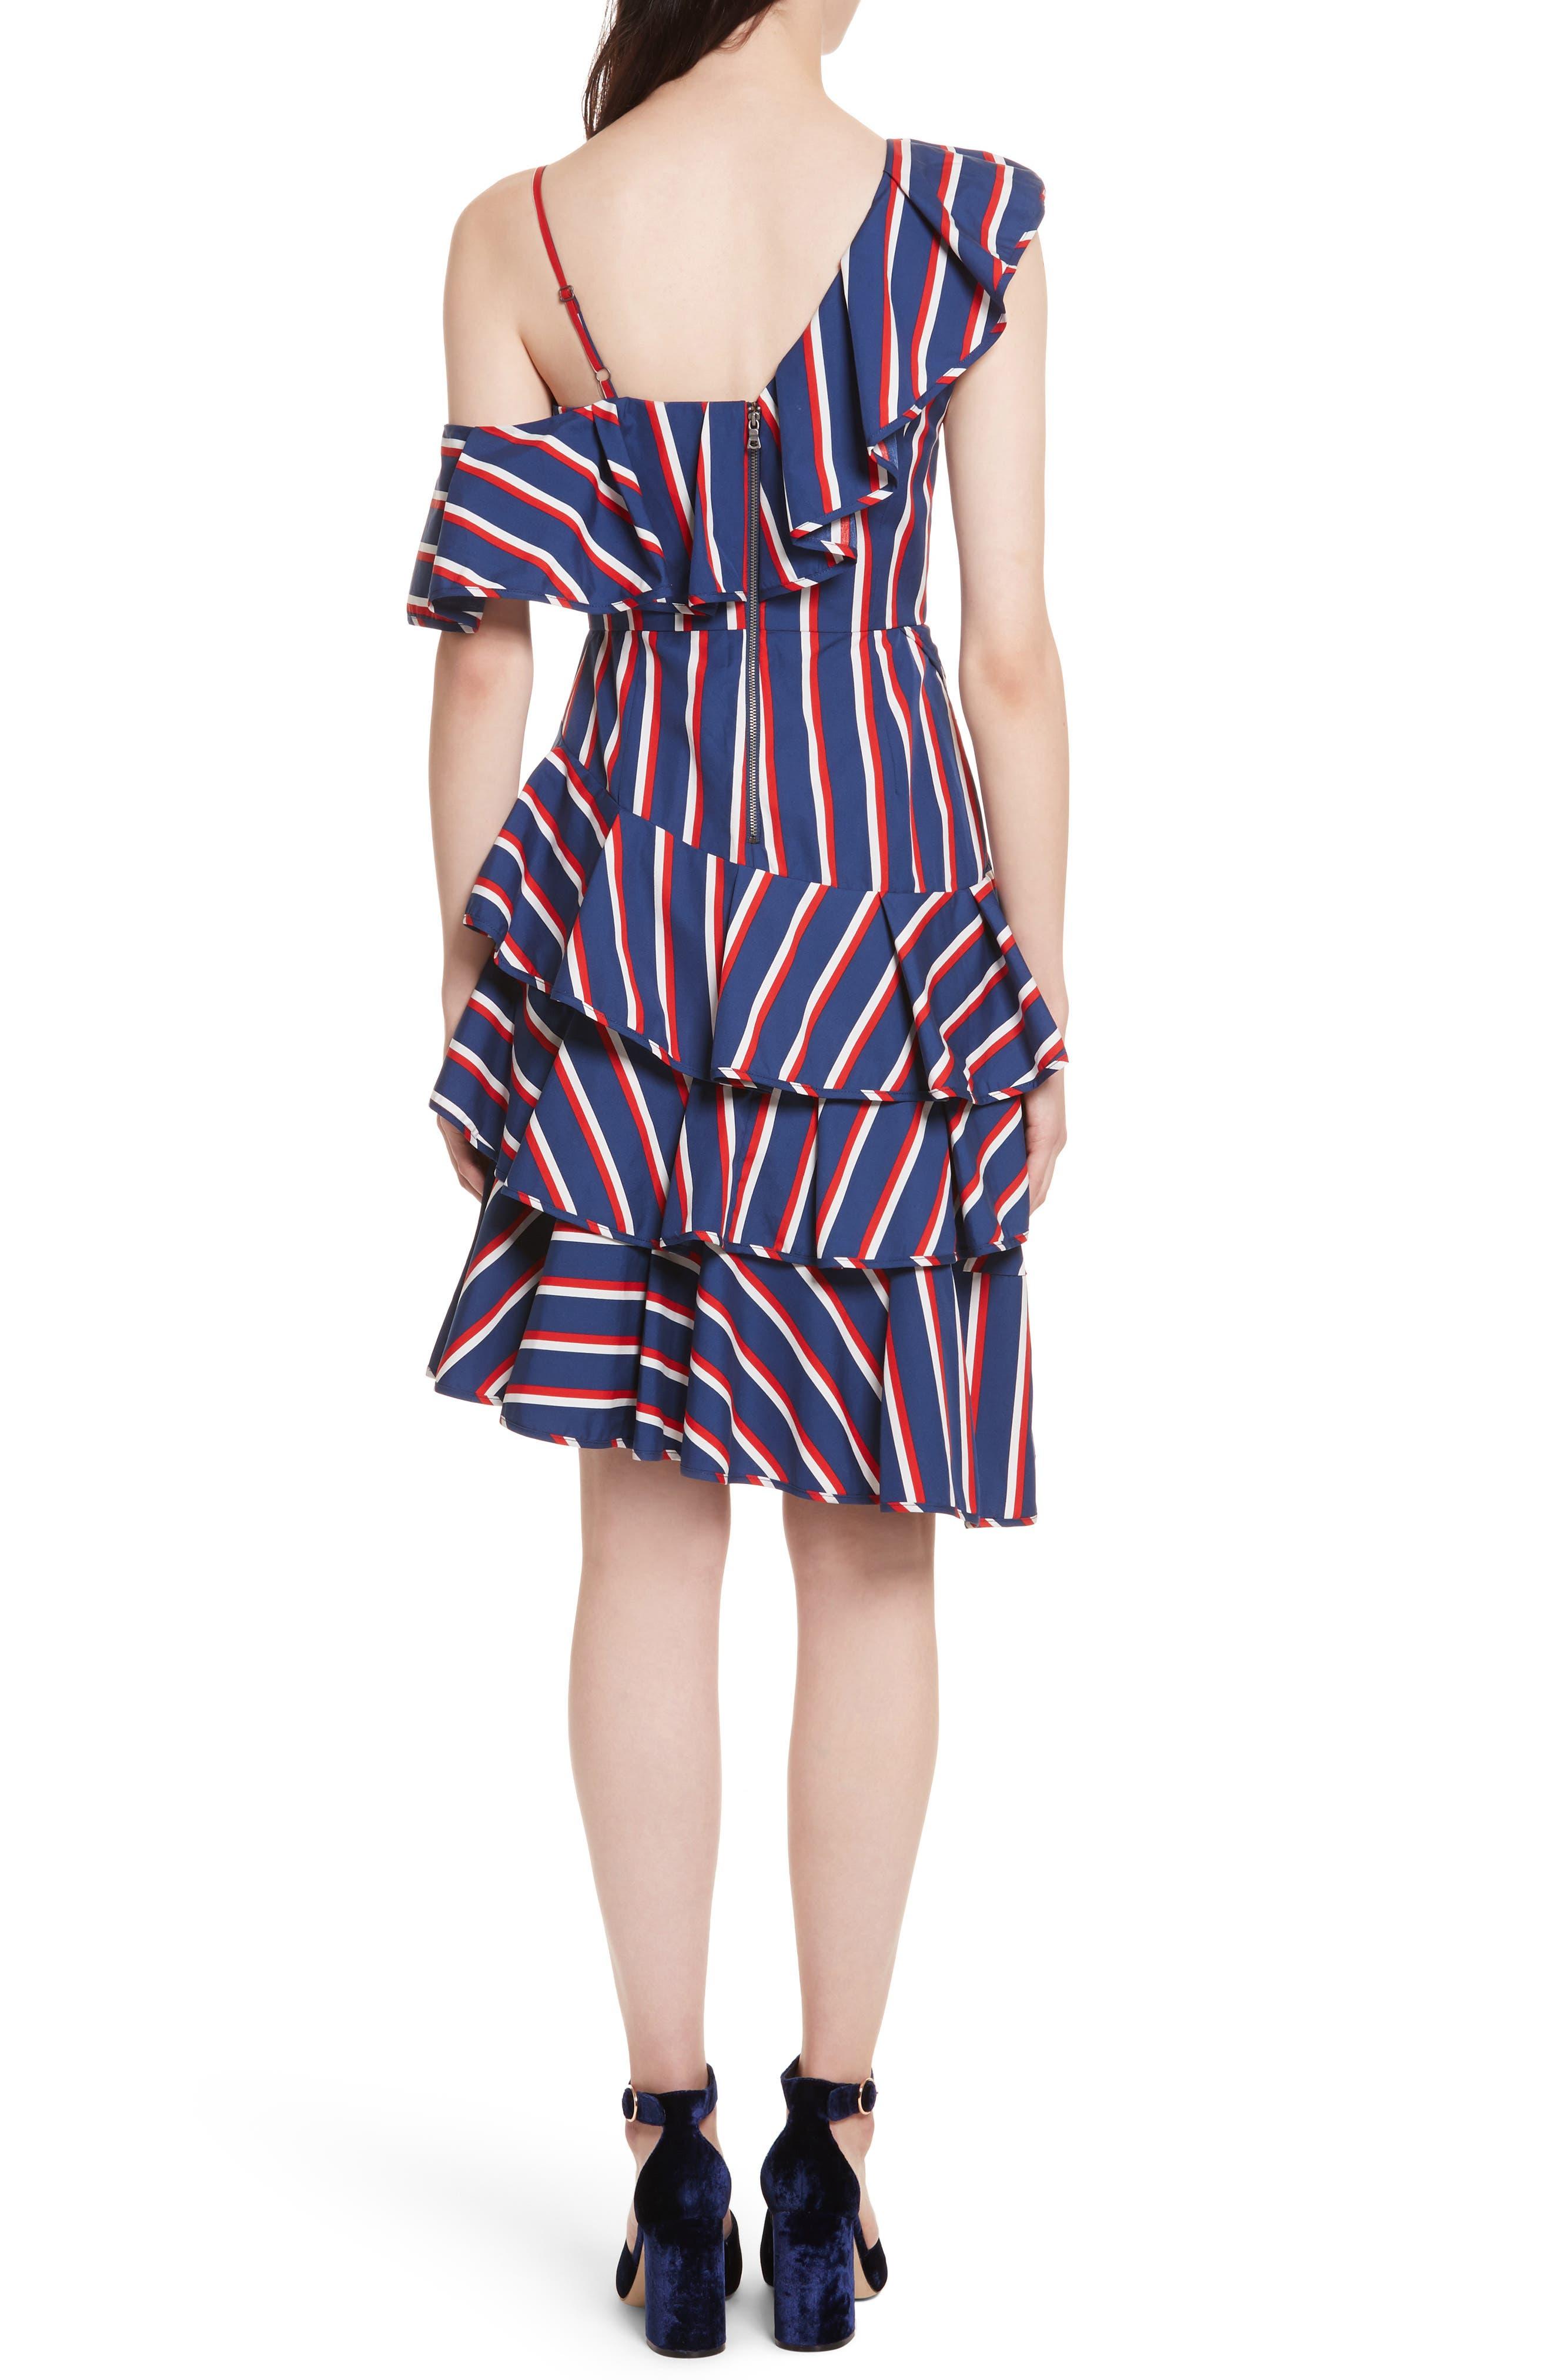 Laflora Aymmetrical Ruffle Midi Dress,                             Alternate thumbnail 2, color,                             475